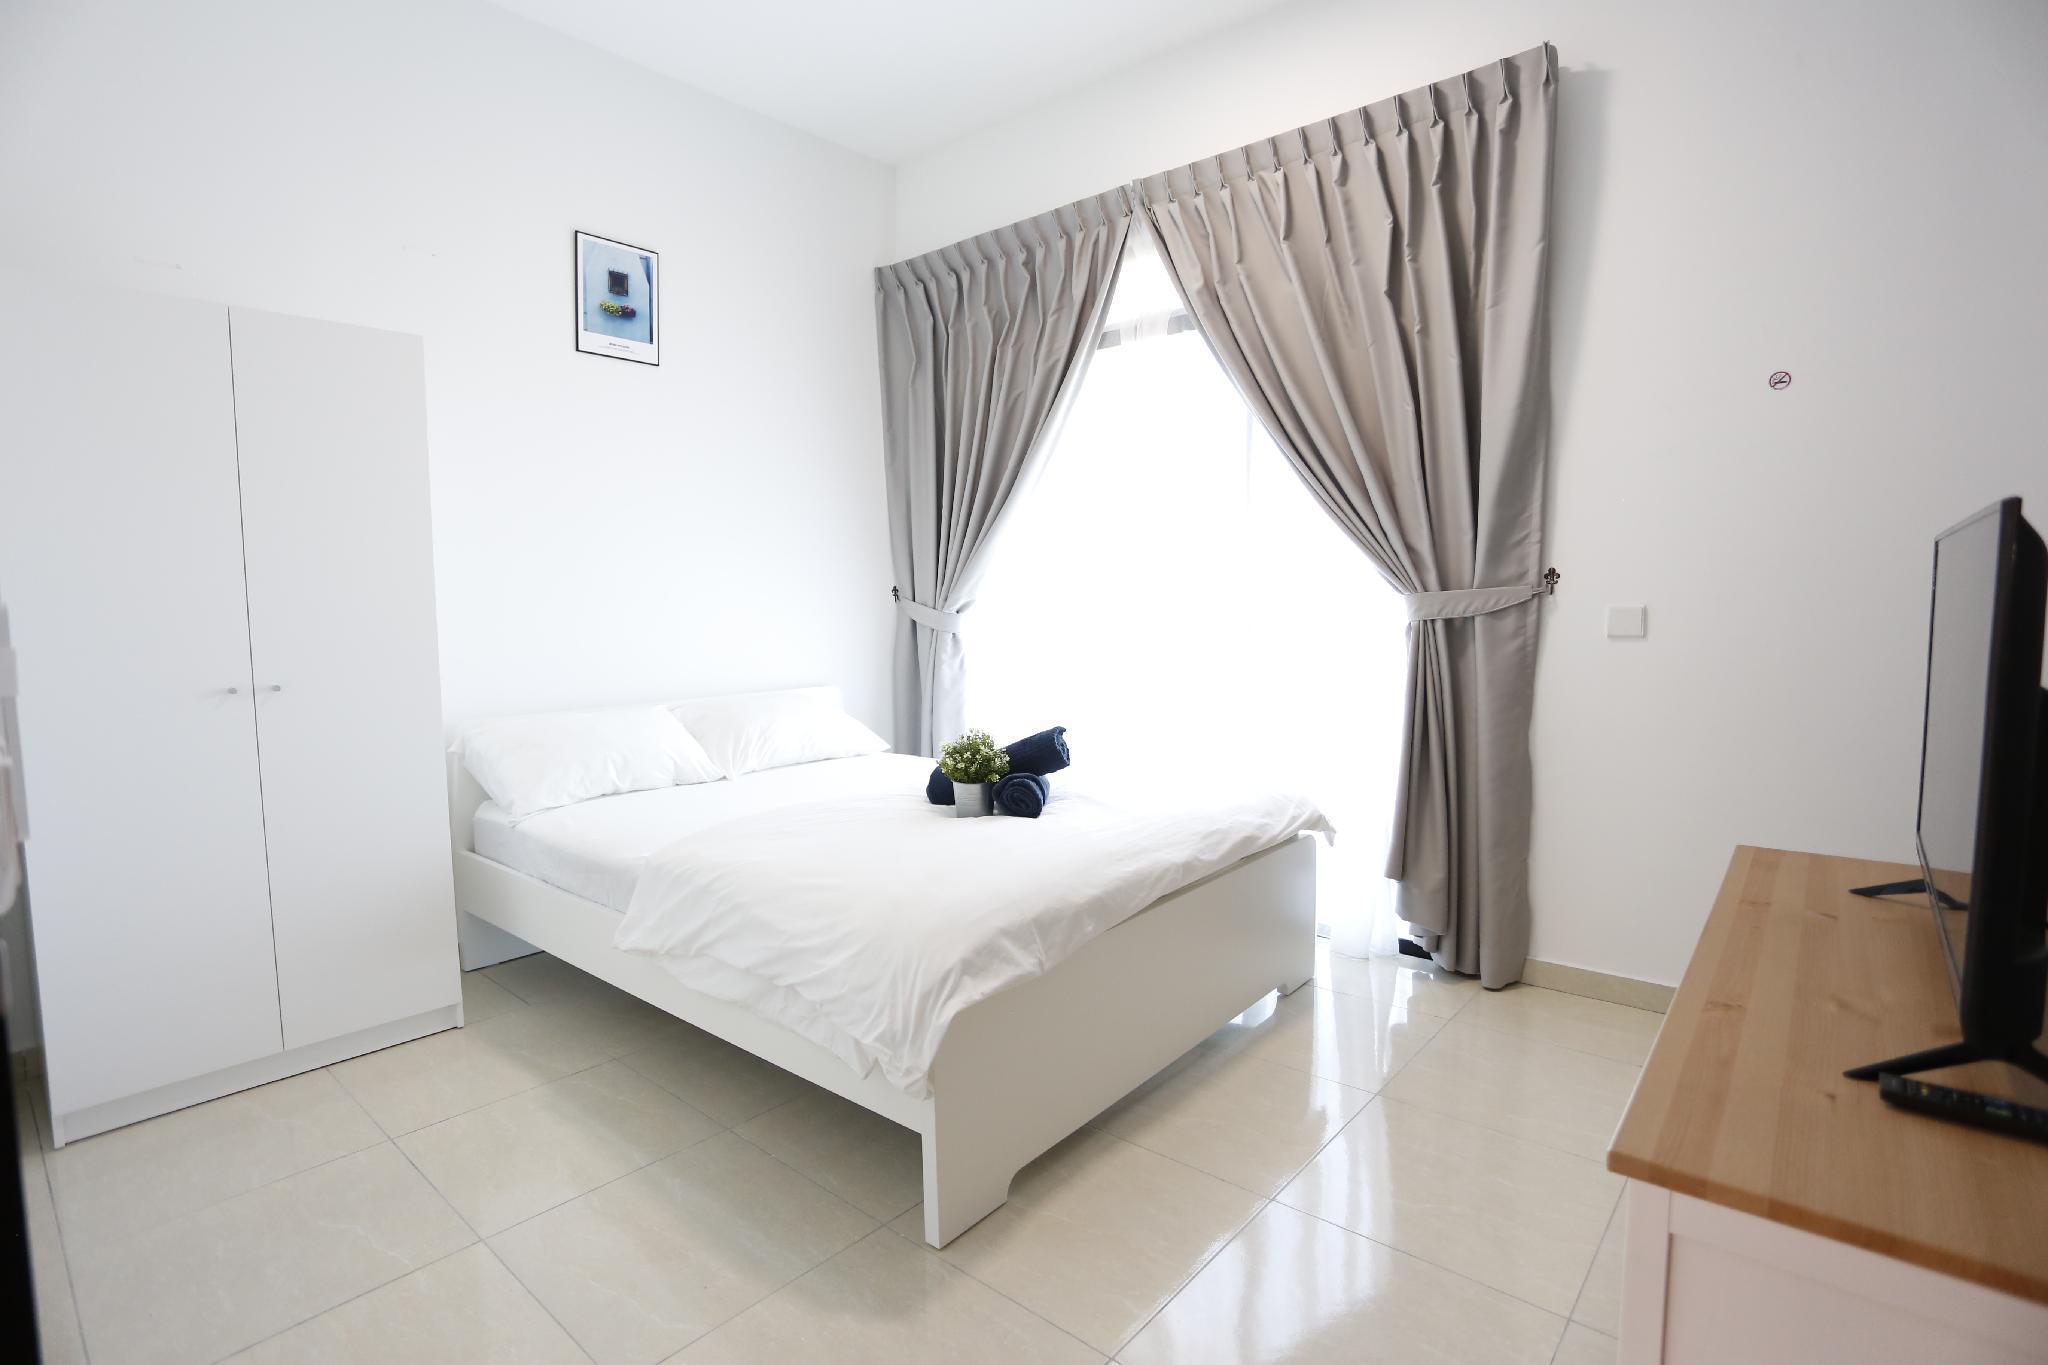 Desire Share Room At JB Busniess Vacation 1501 R4